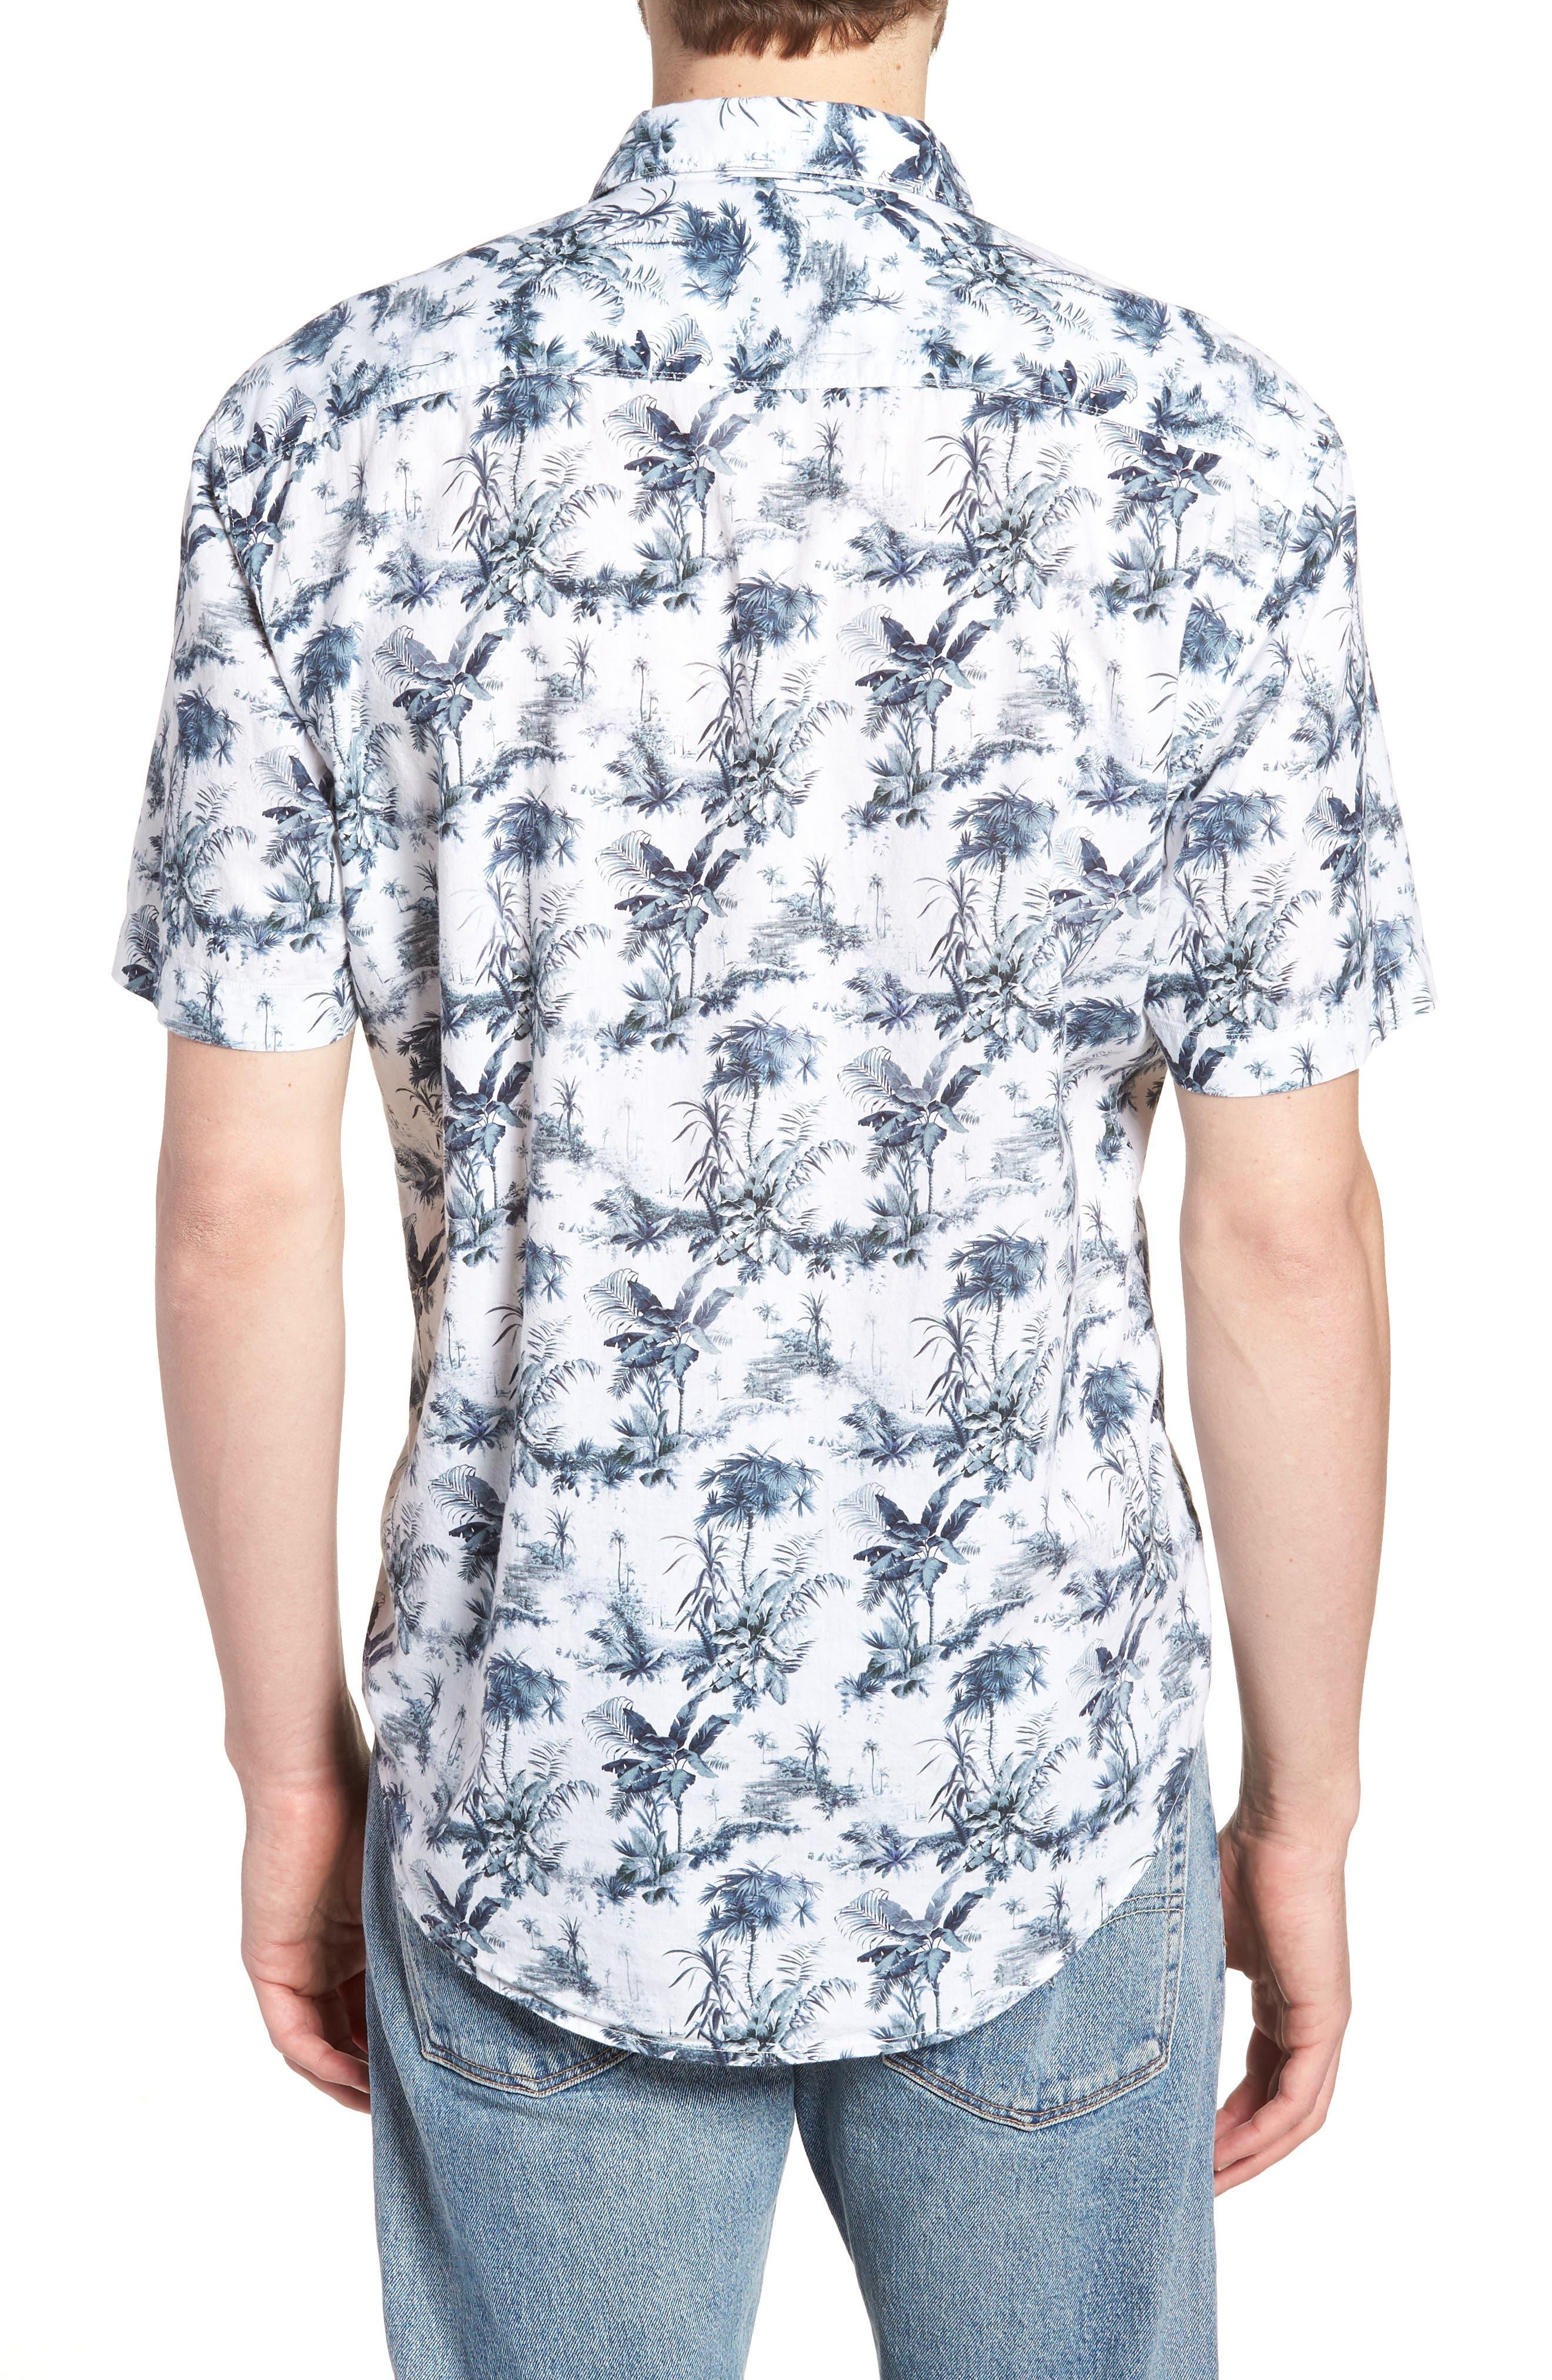 Waiki Regular Fit Short Sleeve Sport Shirt,                             Alternate thumbnail 2, color,                             100